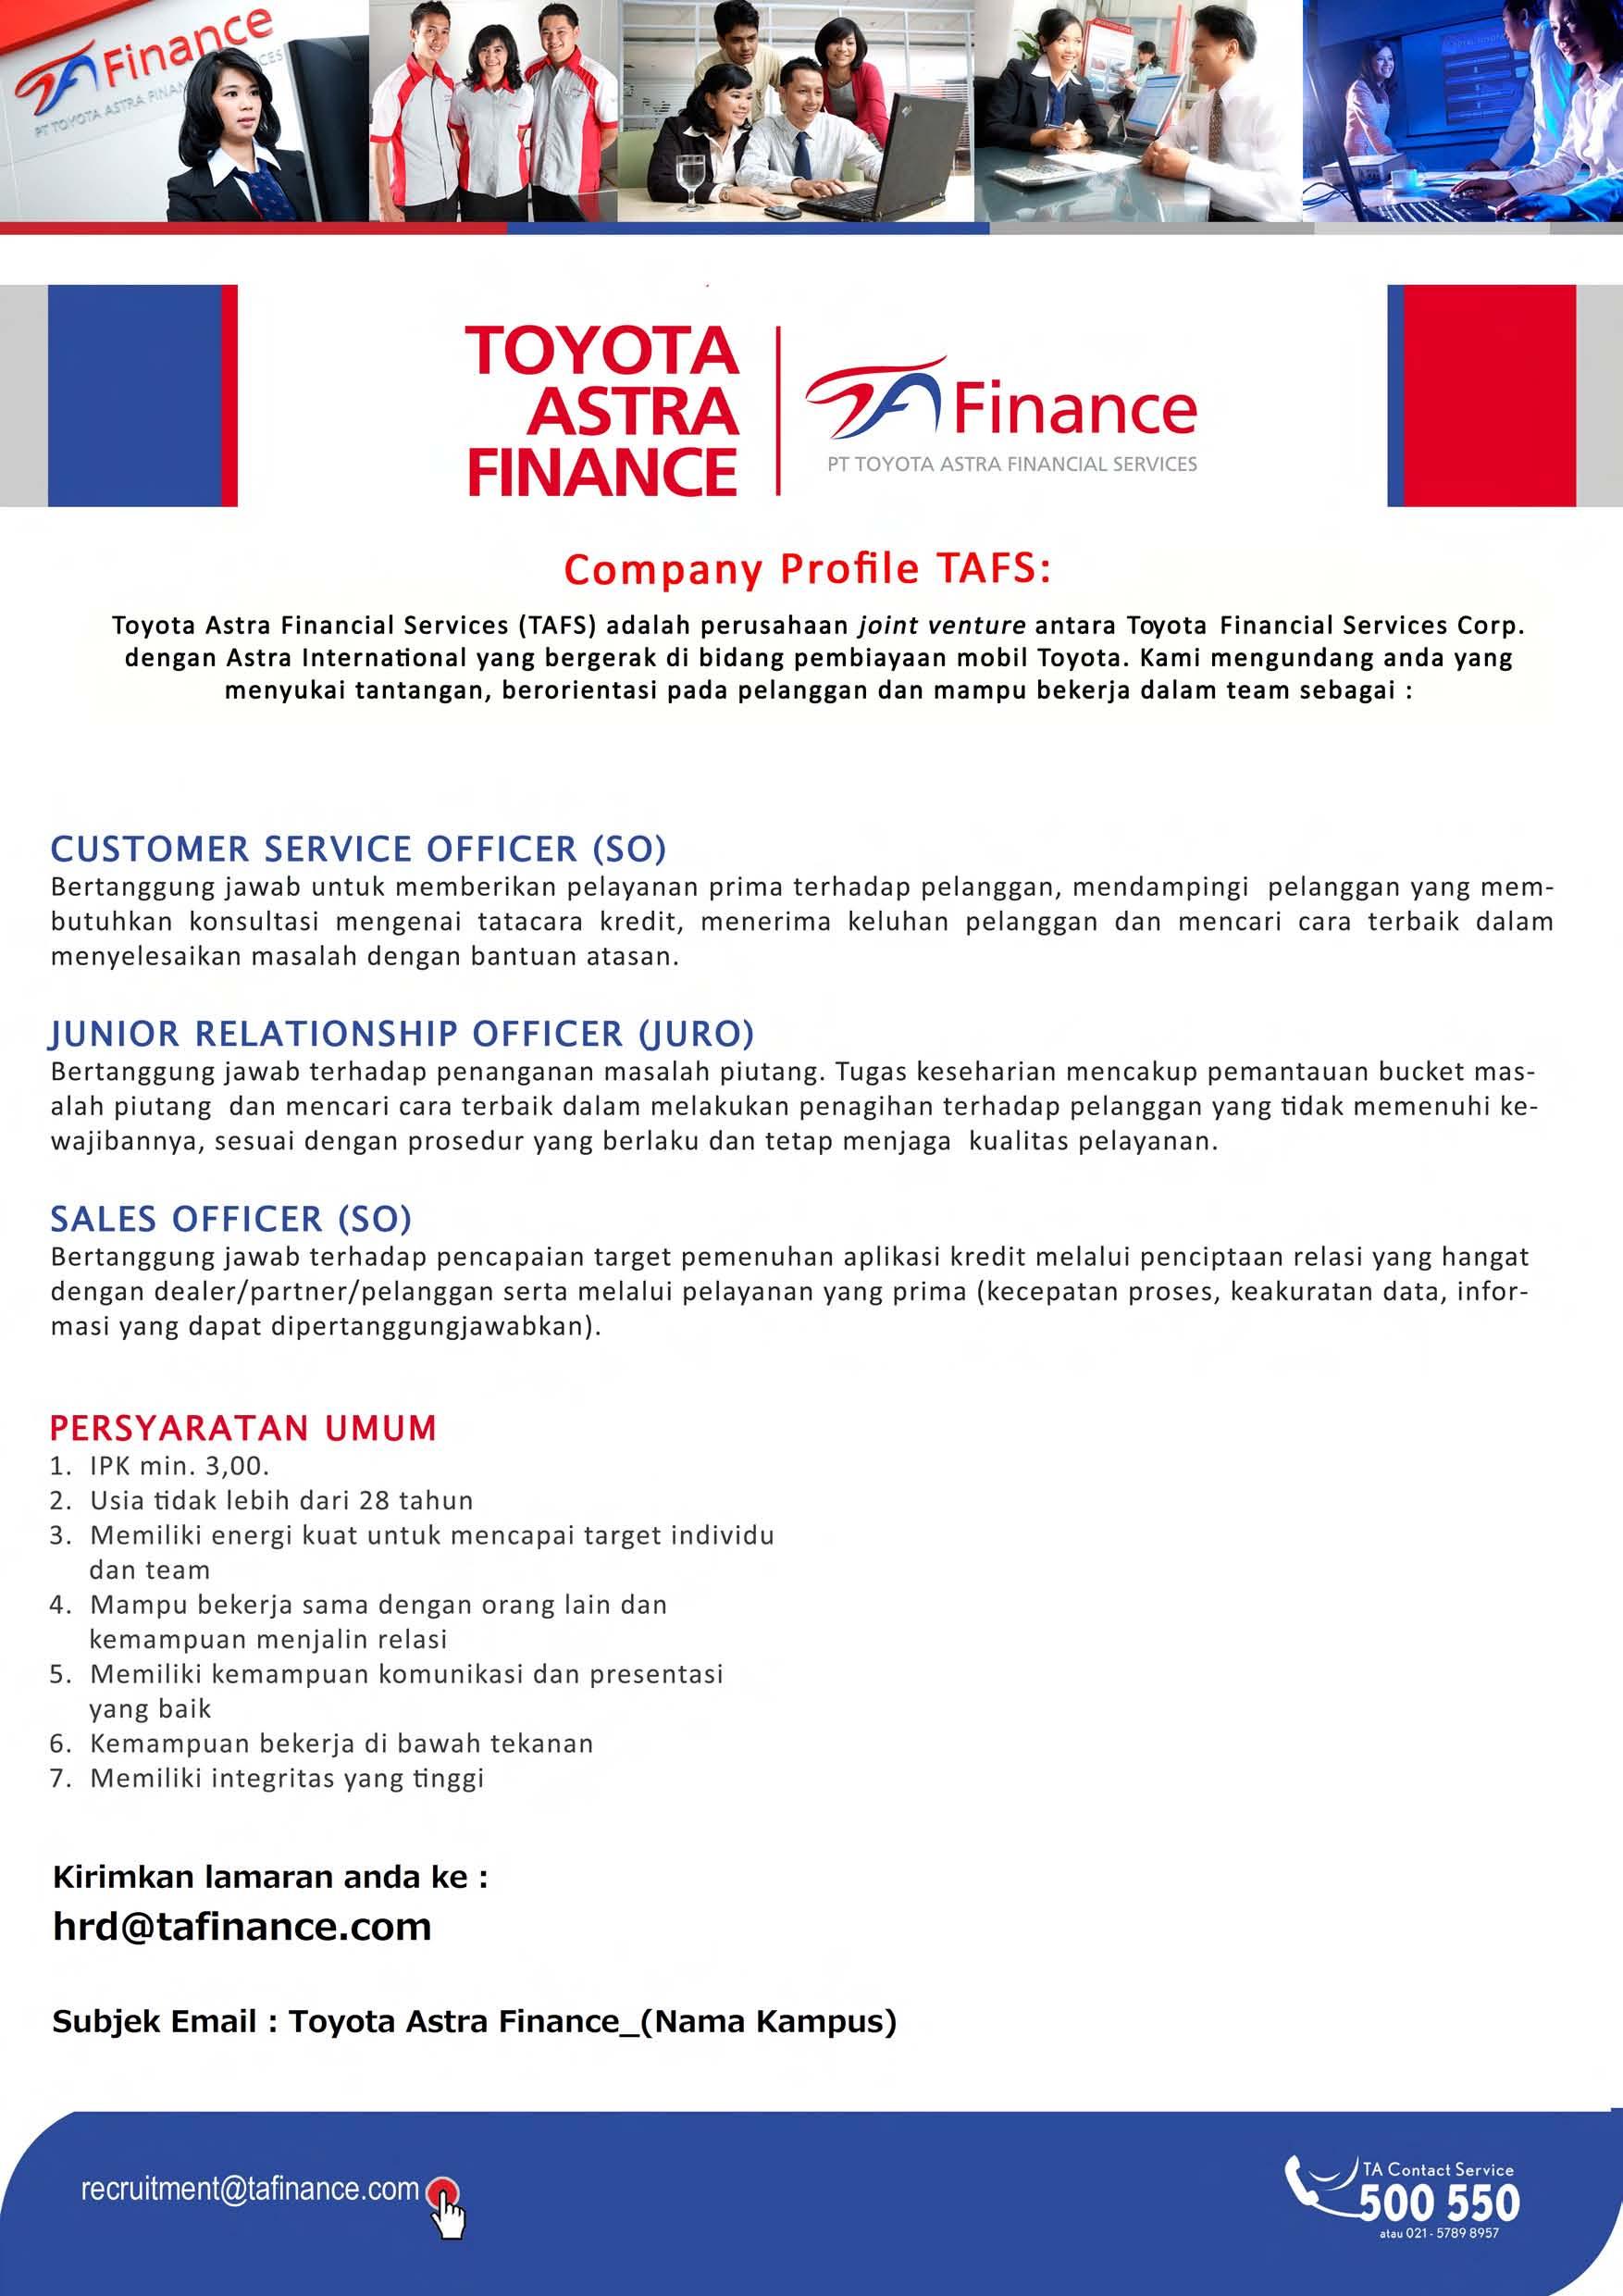 Pt Toyota Astra Financial Services Universitas Esa Unggul